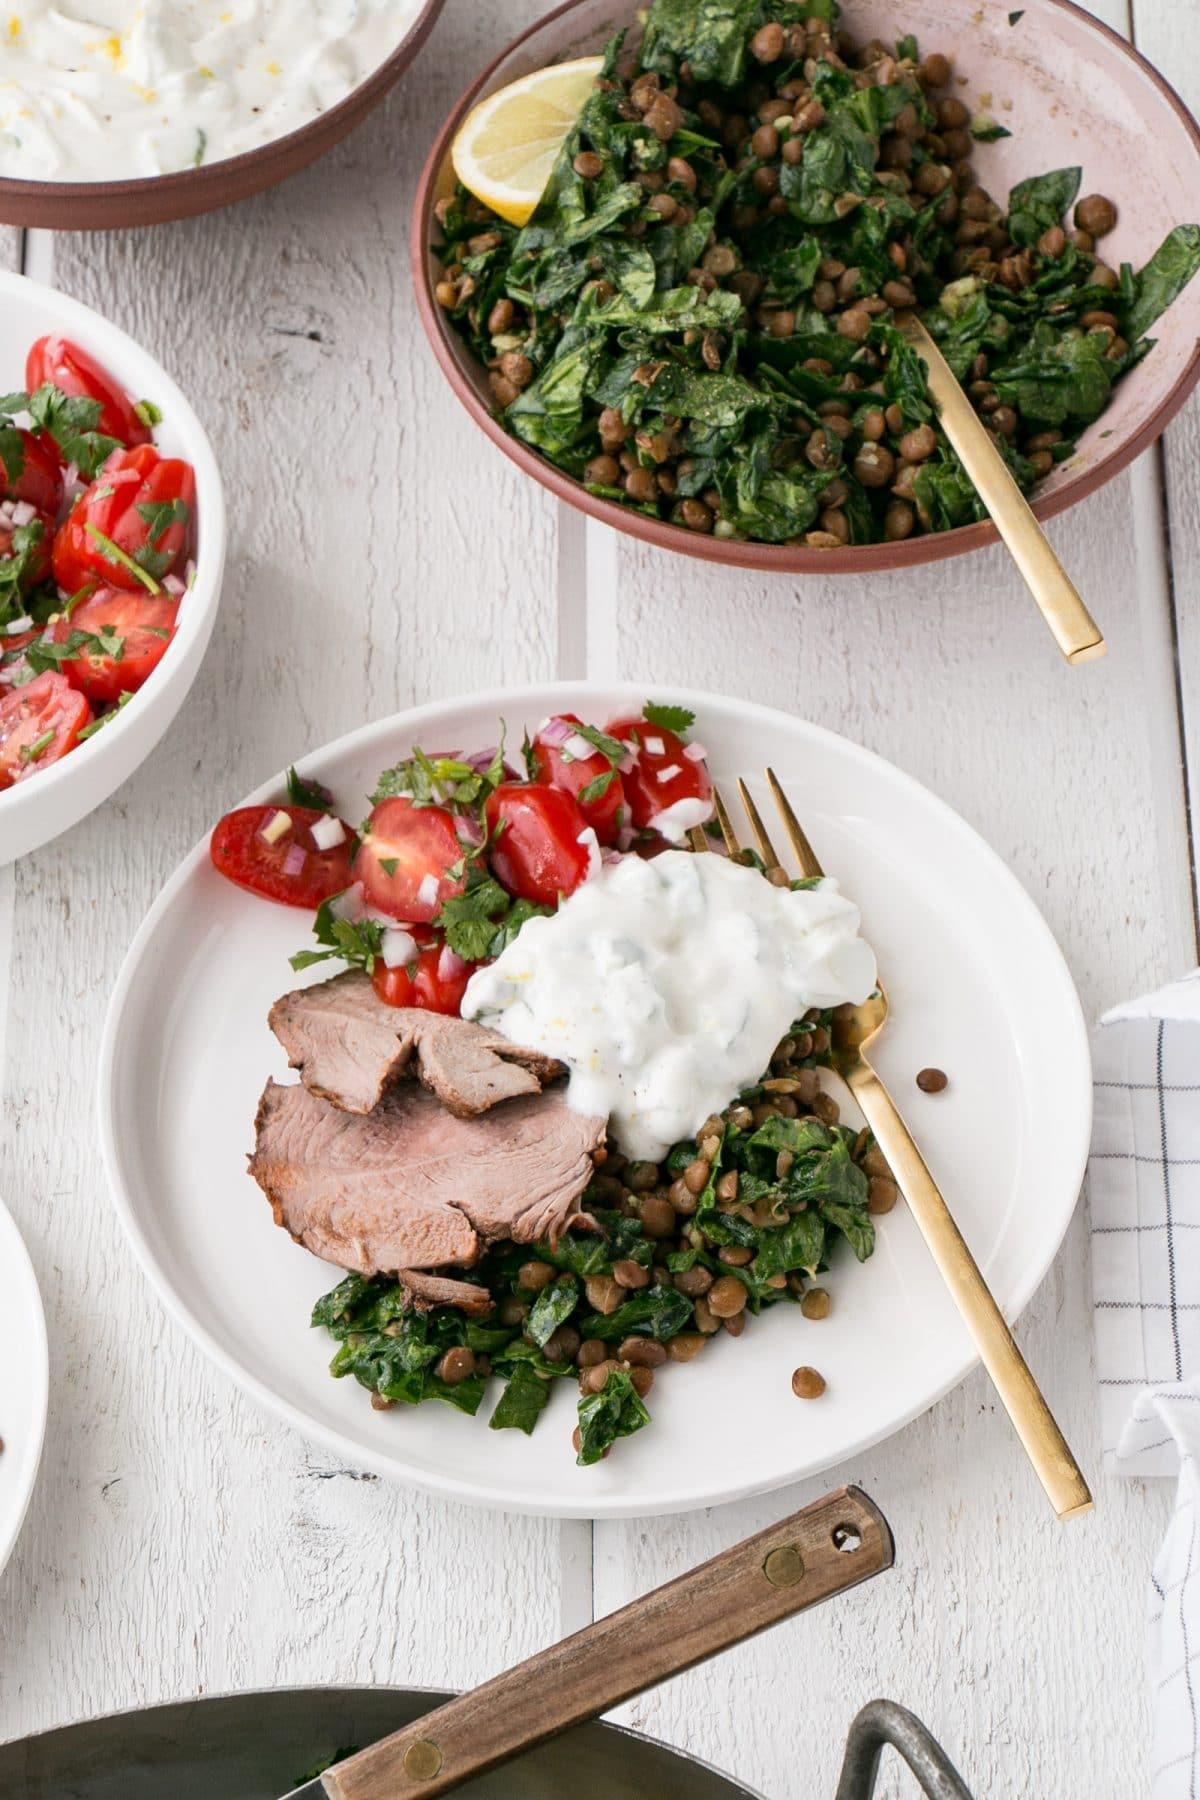 Curry spiced leg of lamb, spinach lentils, tomato salas and lemon yogurt on plate